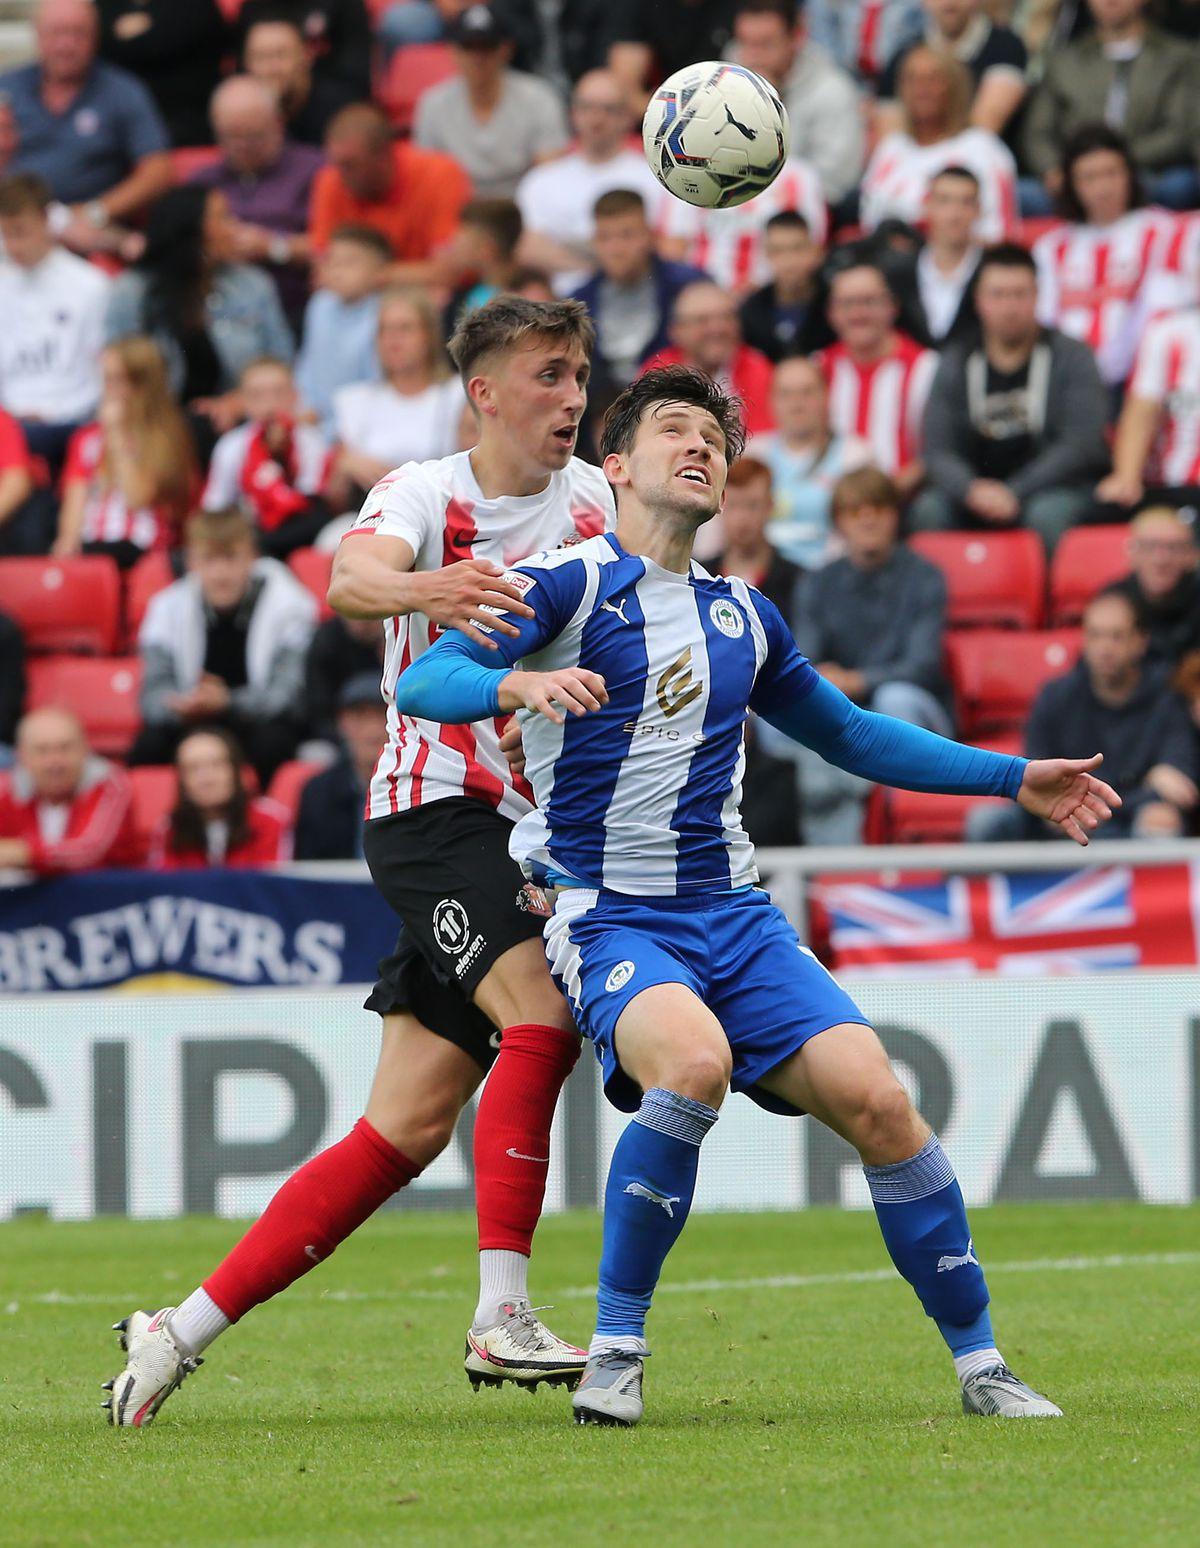 Sunderland v Wigan Athletic - Sky Bet League One